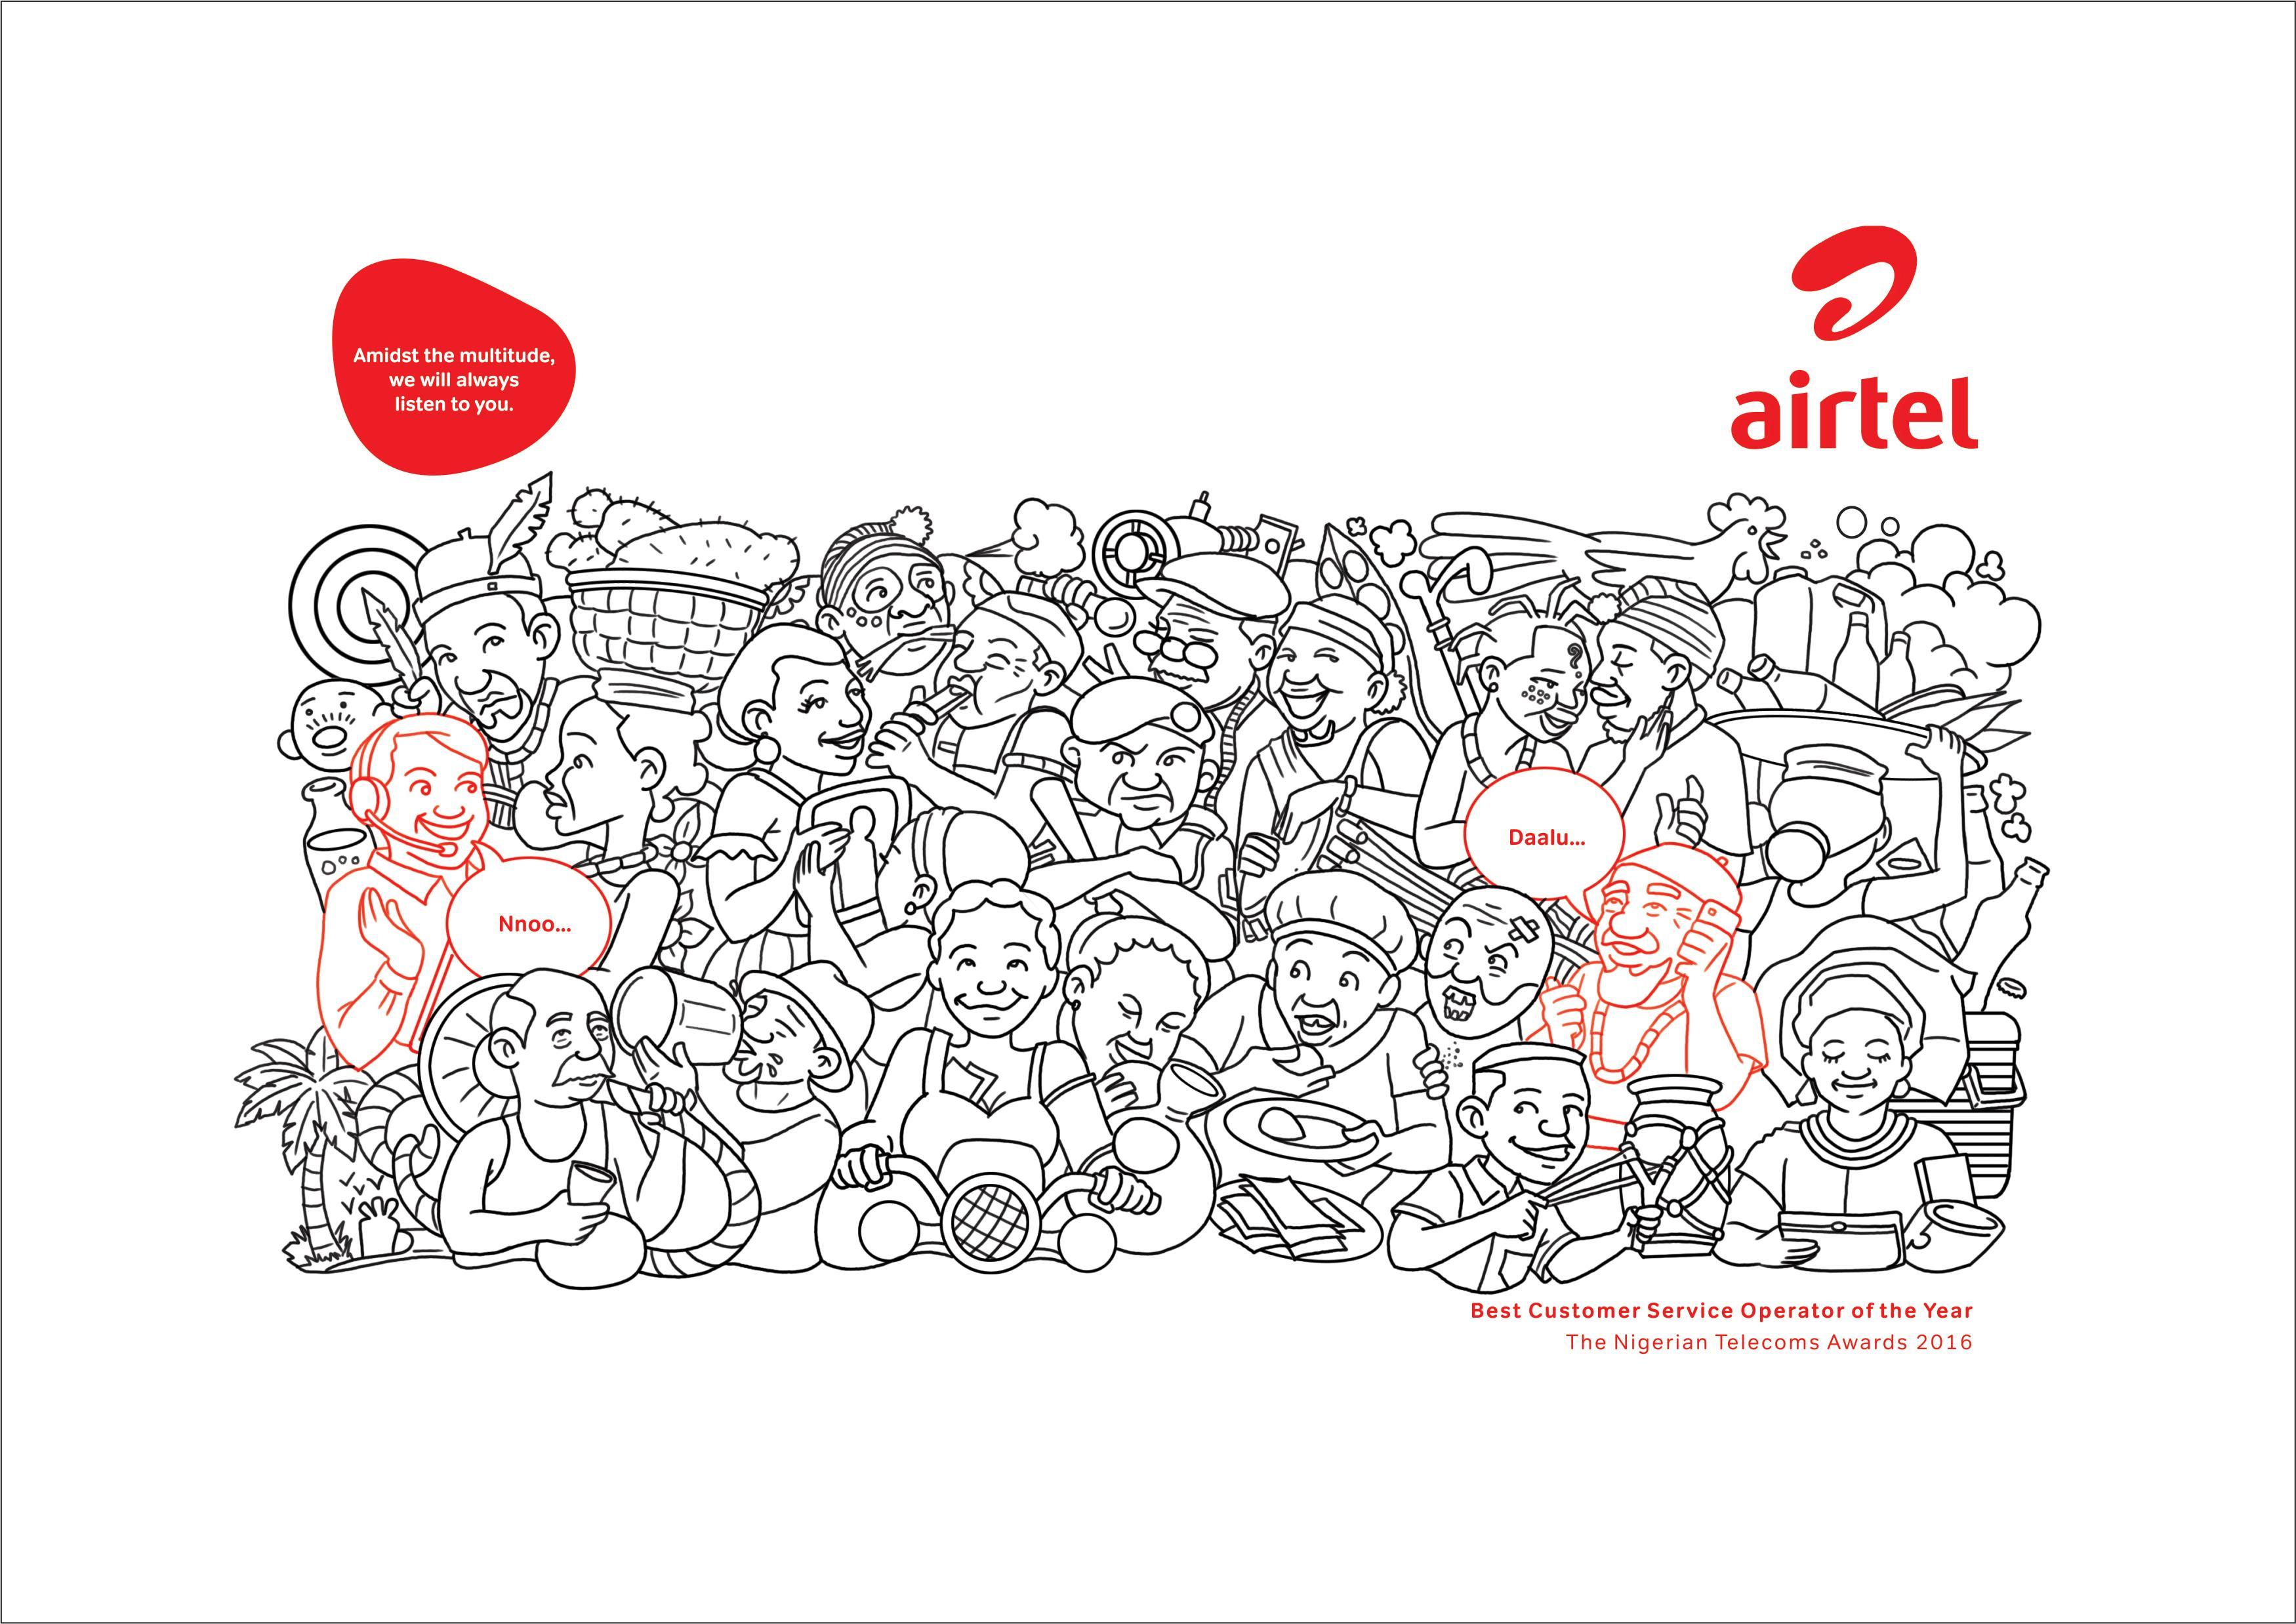 Airtel Print Ad - Easterners